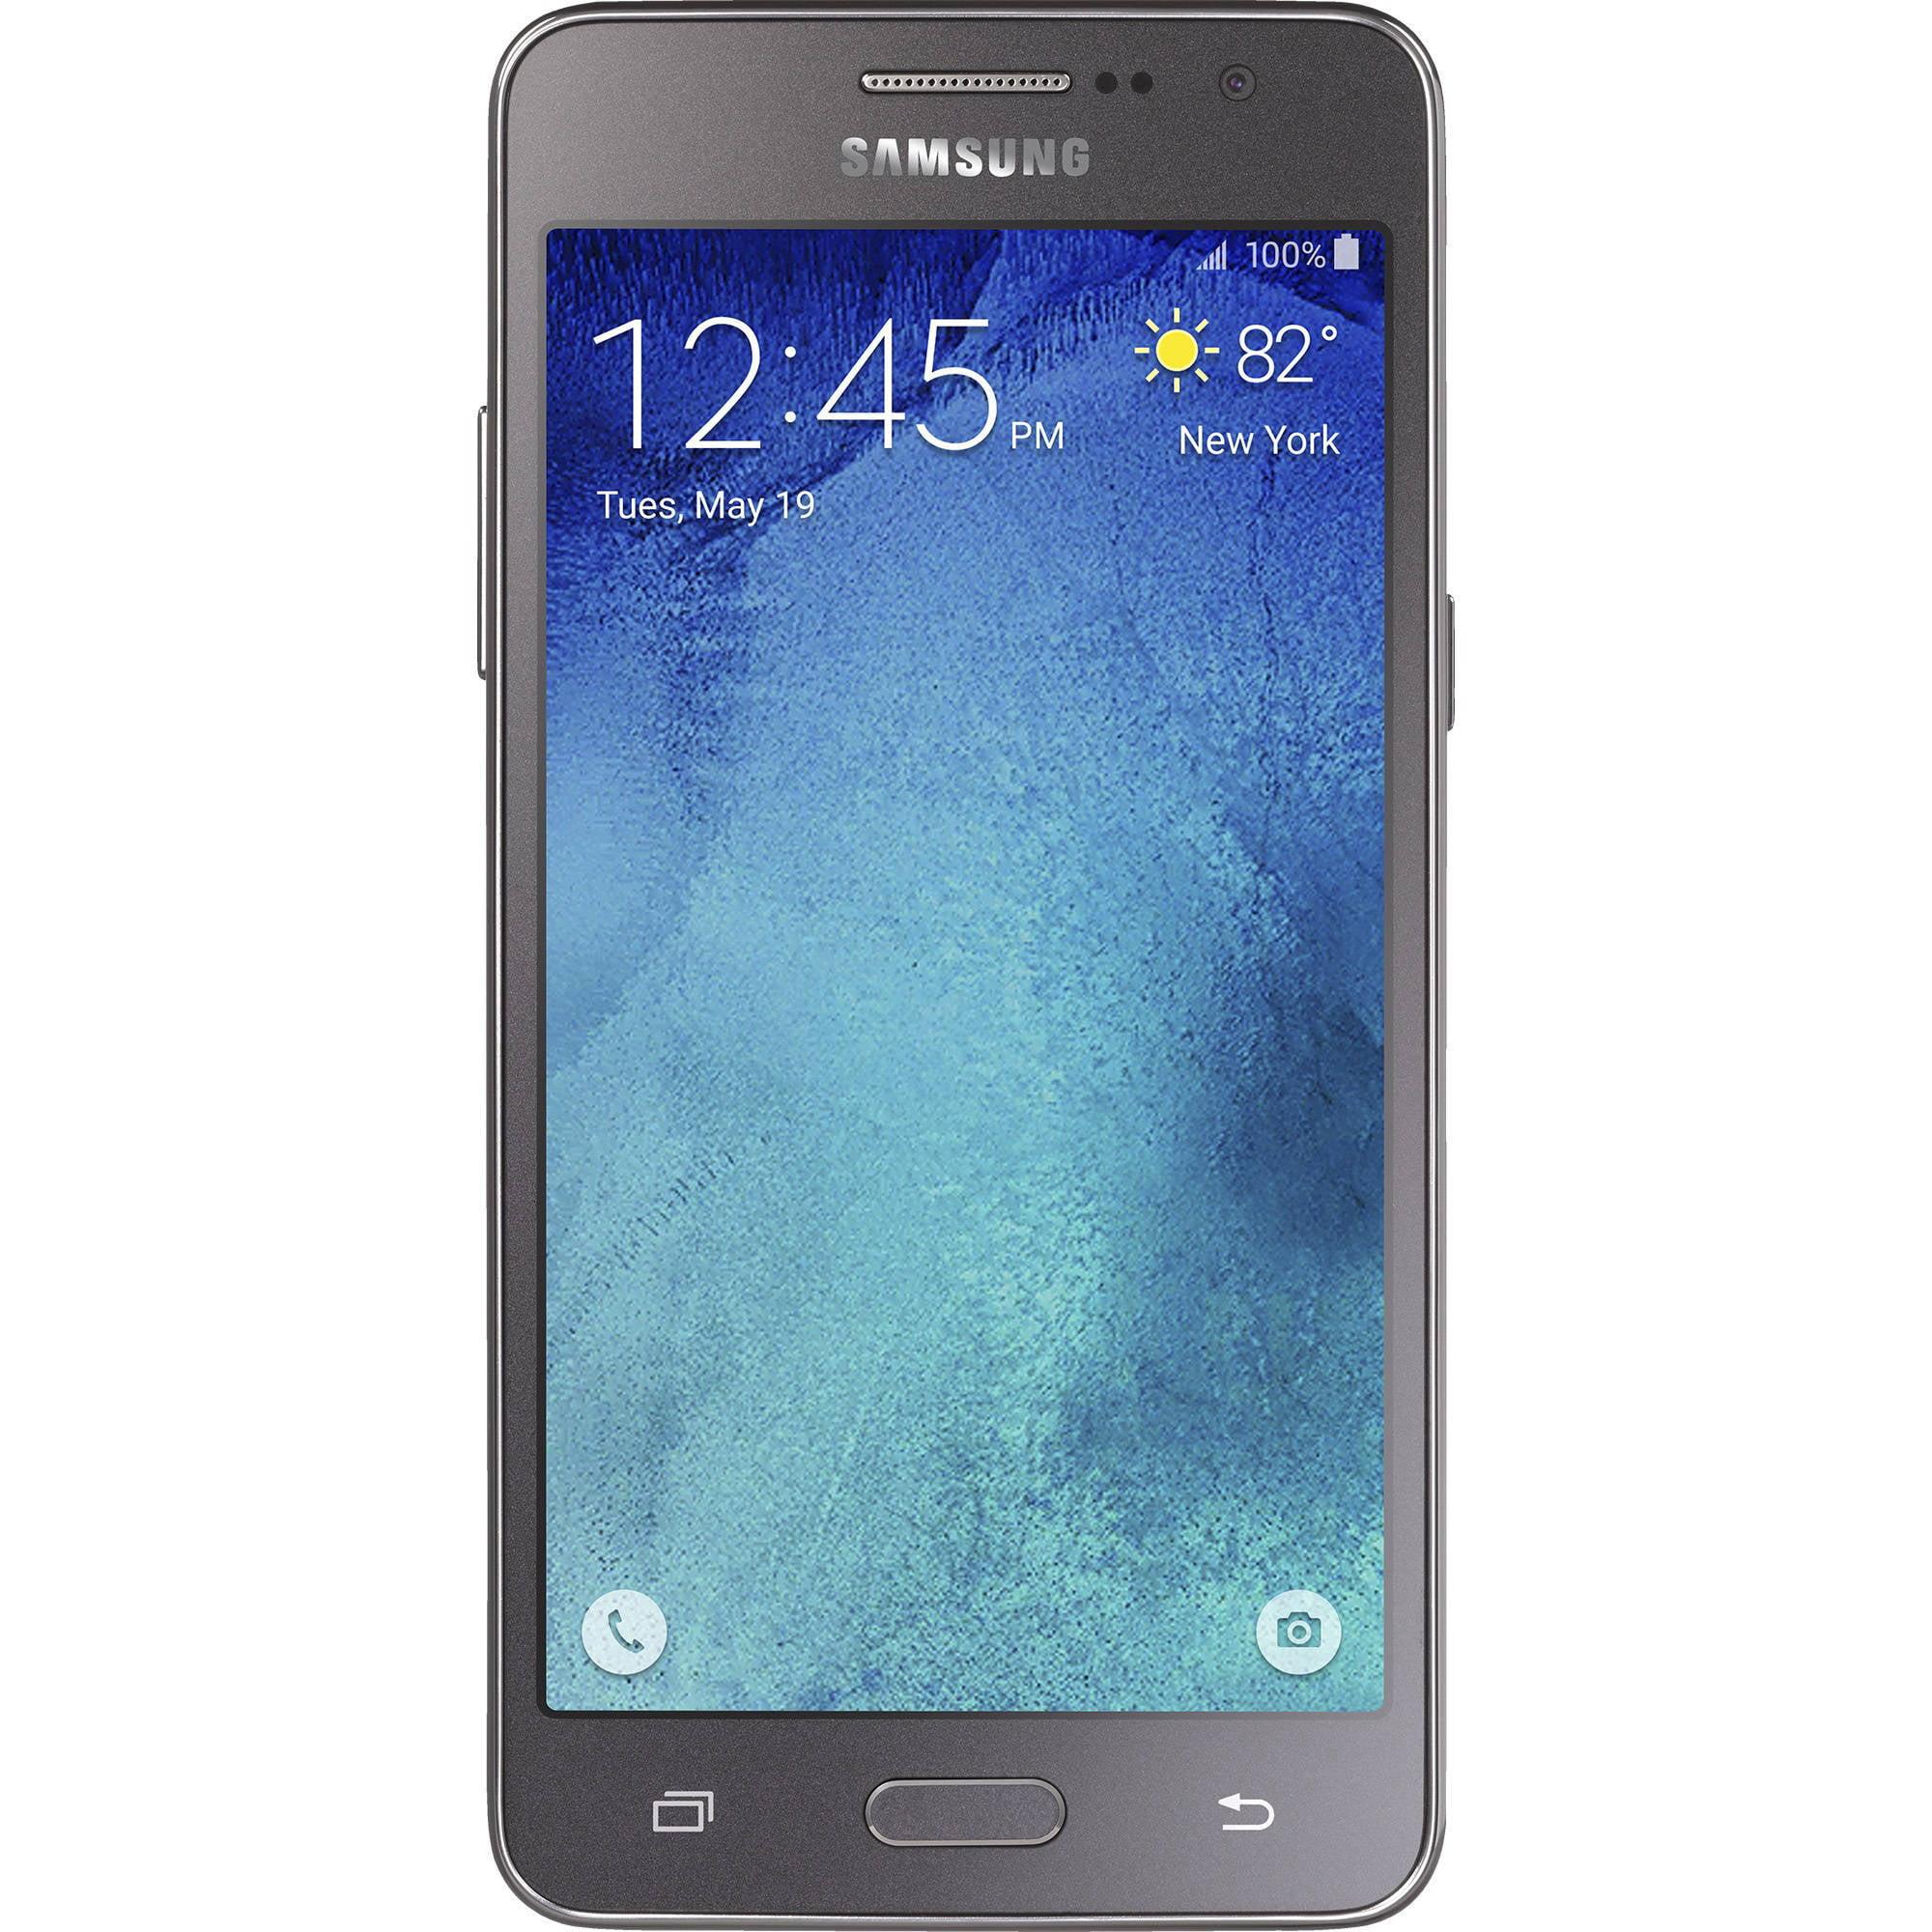 Straight Talk Samsung Galaxy GRAND Prime 4G LTE Android Prepaid Smartphone